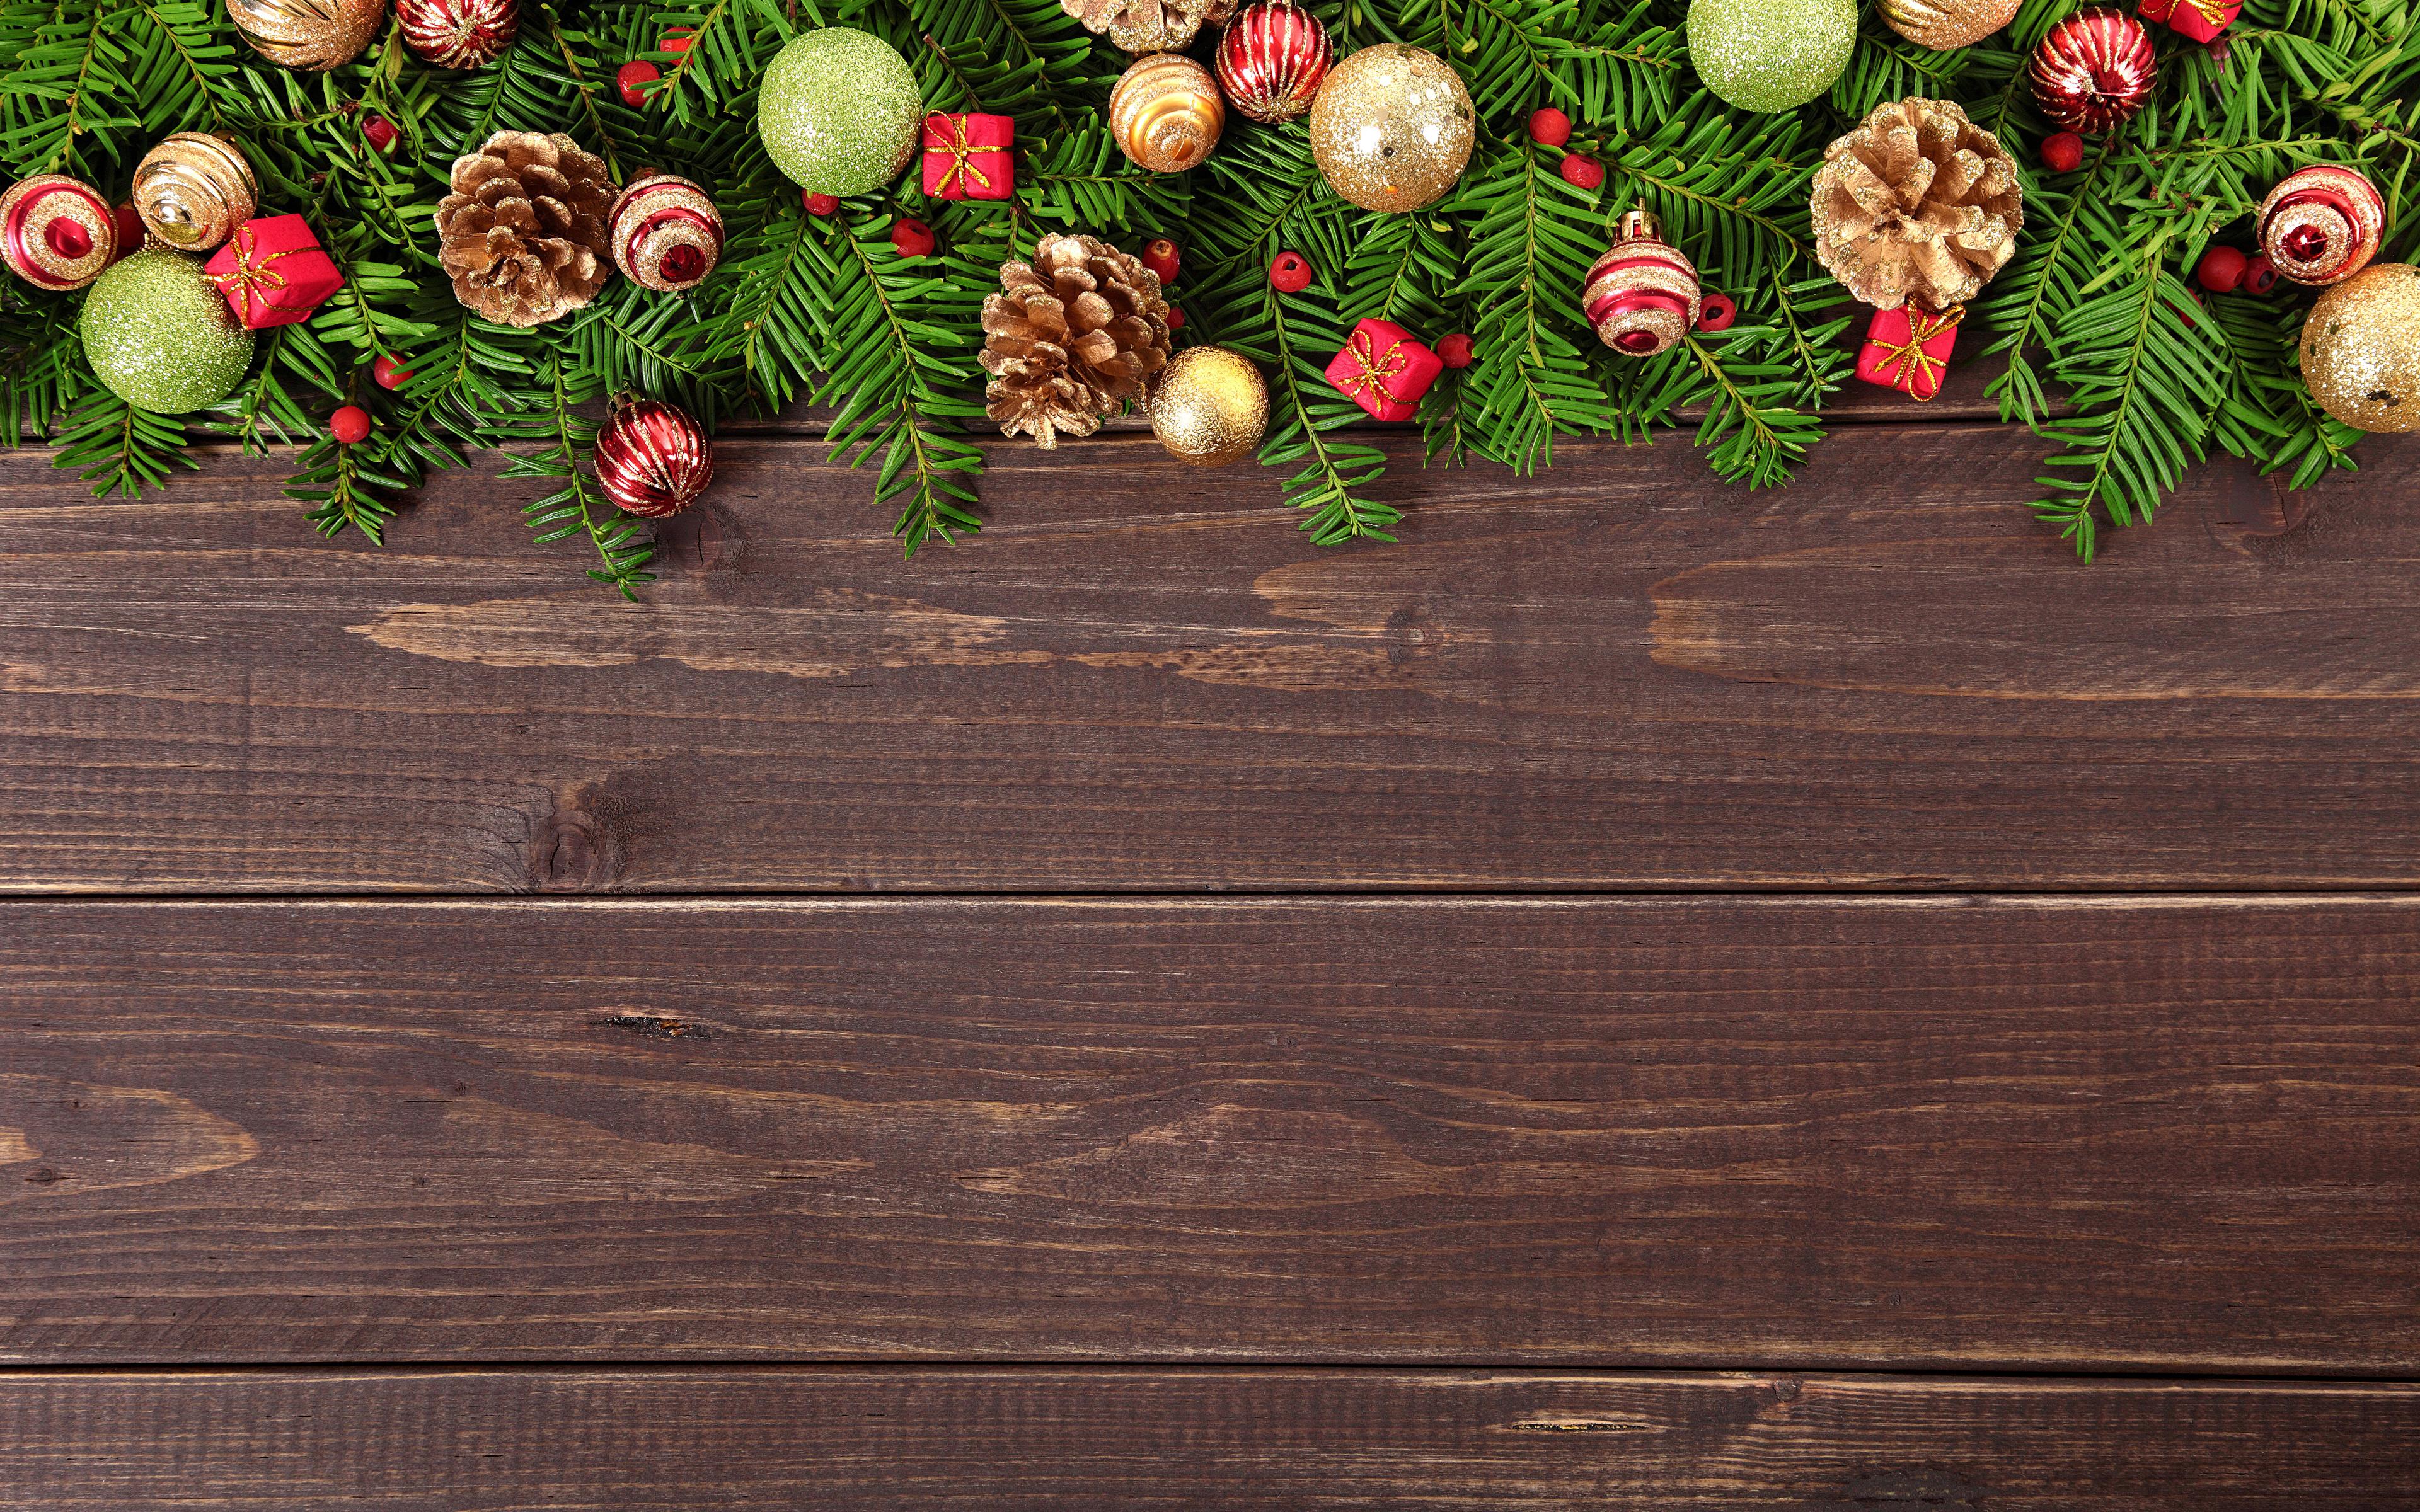 Картинка Рождество Шар шишка Доски 3840x2400 Новый год Шишки Шарики